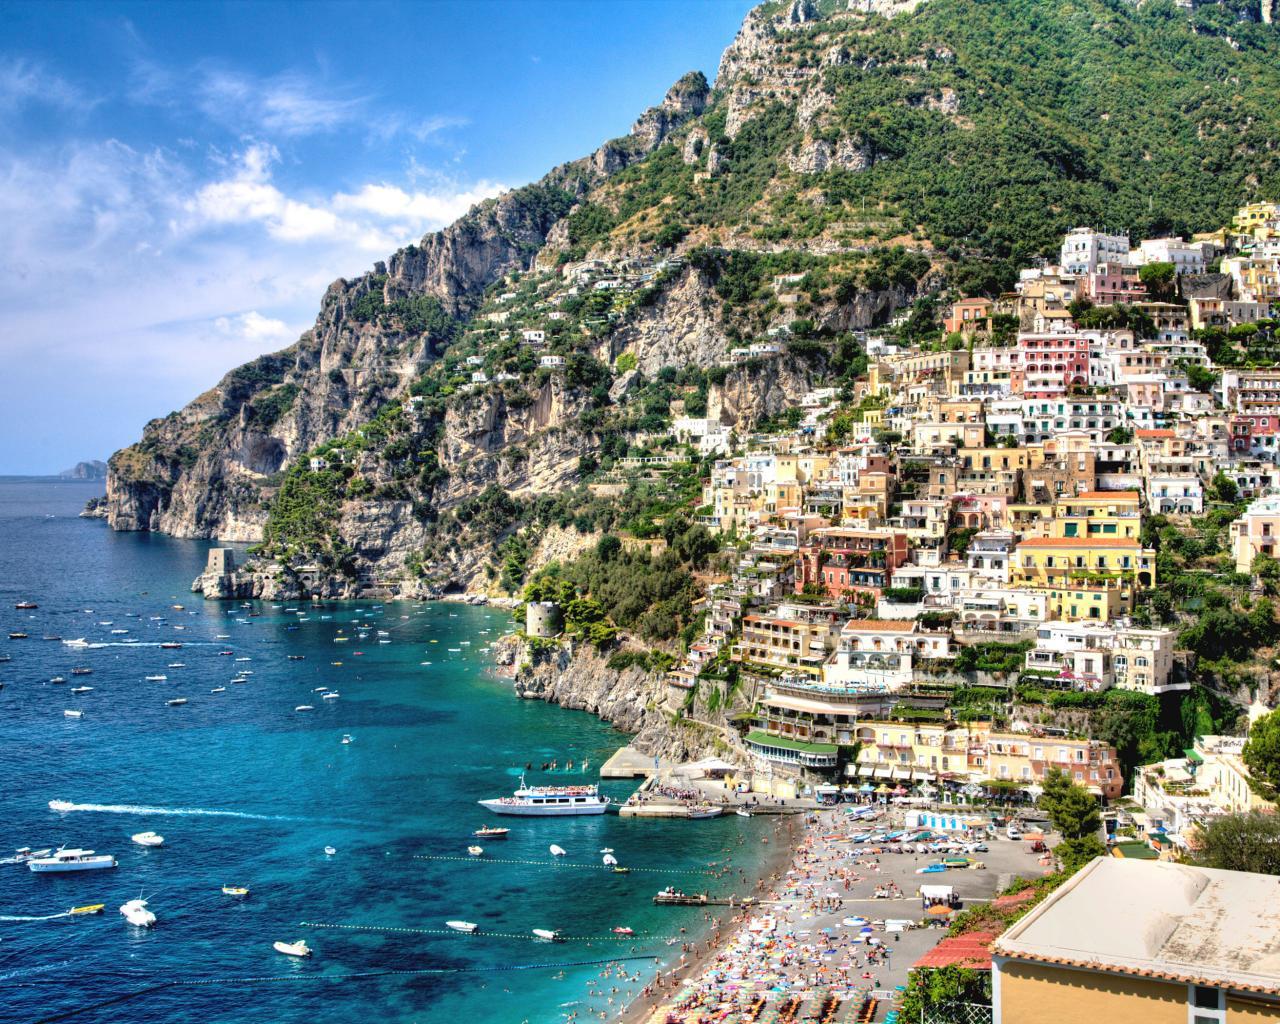 Positano, Amalfi Coast Italy10